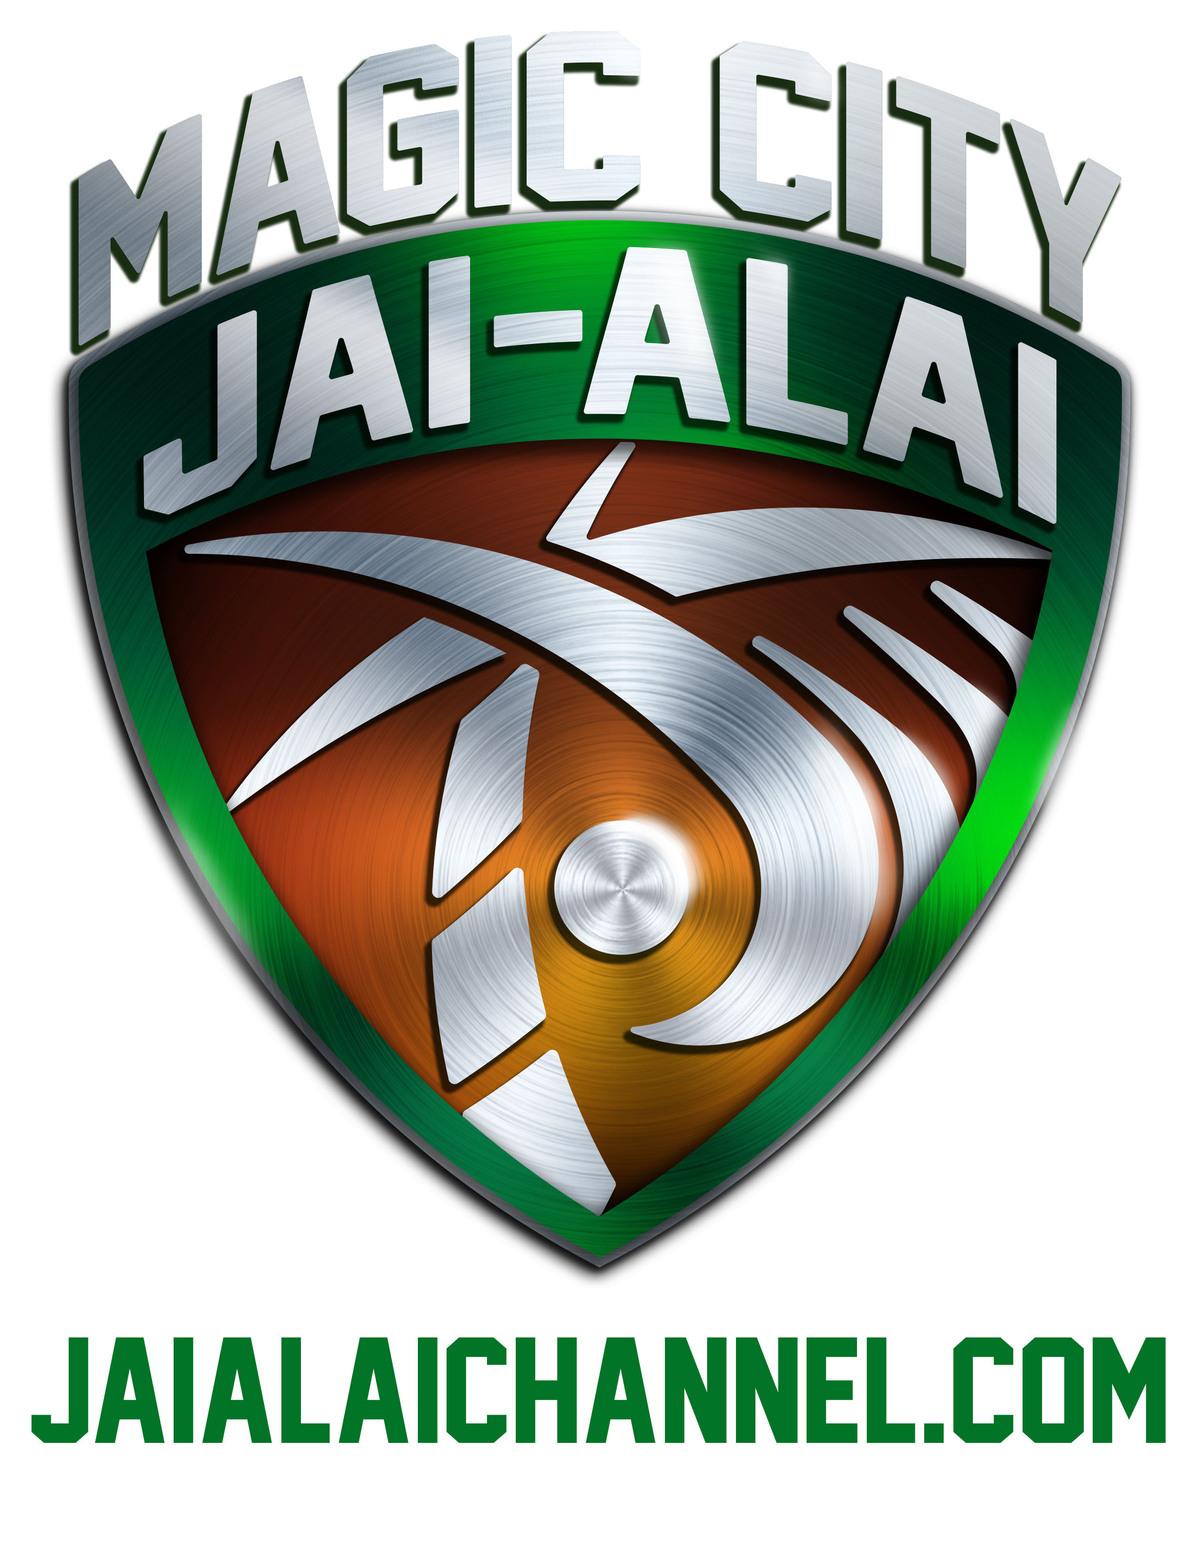 Jai-Alai H2H - Doubles H2H - Sat. Jul, 3 2021